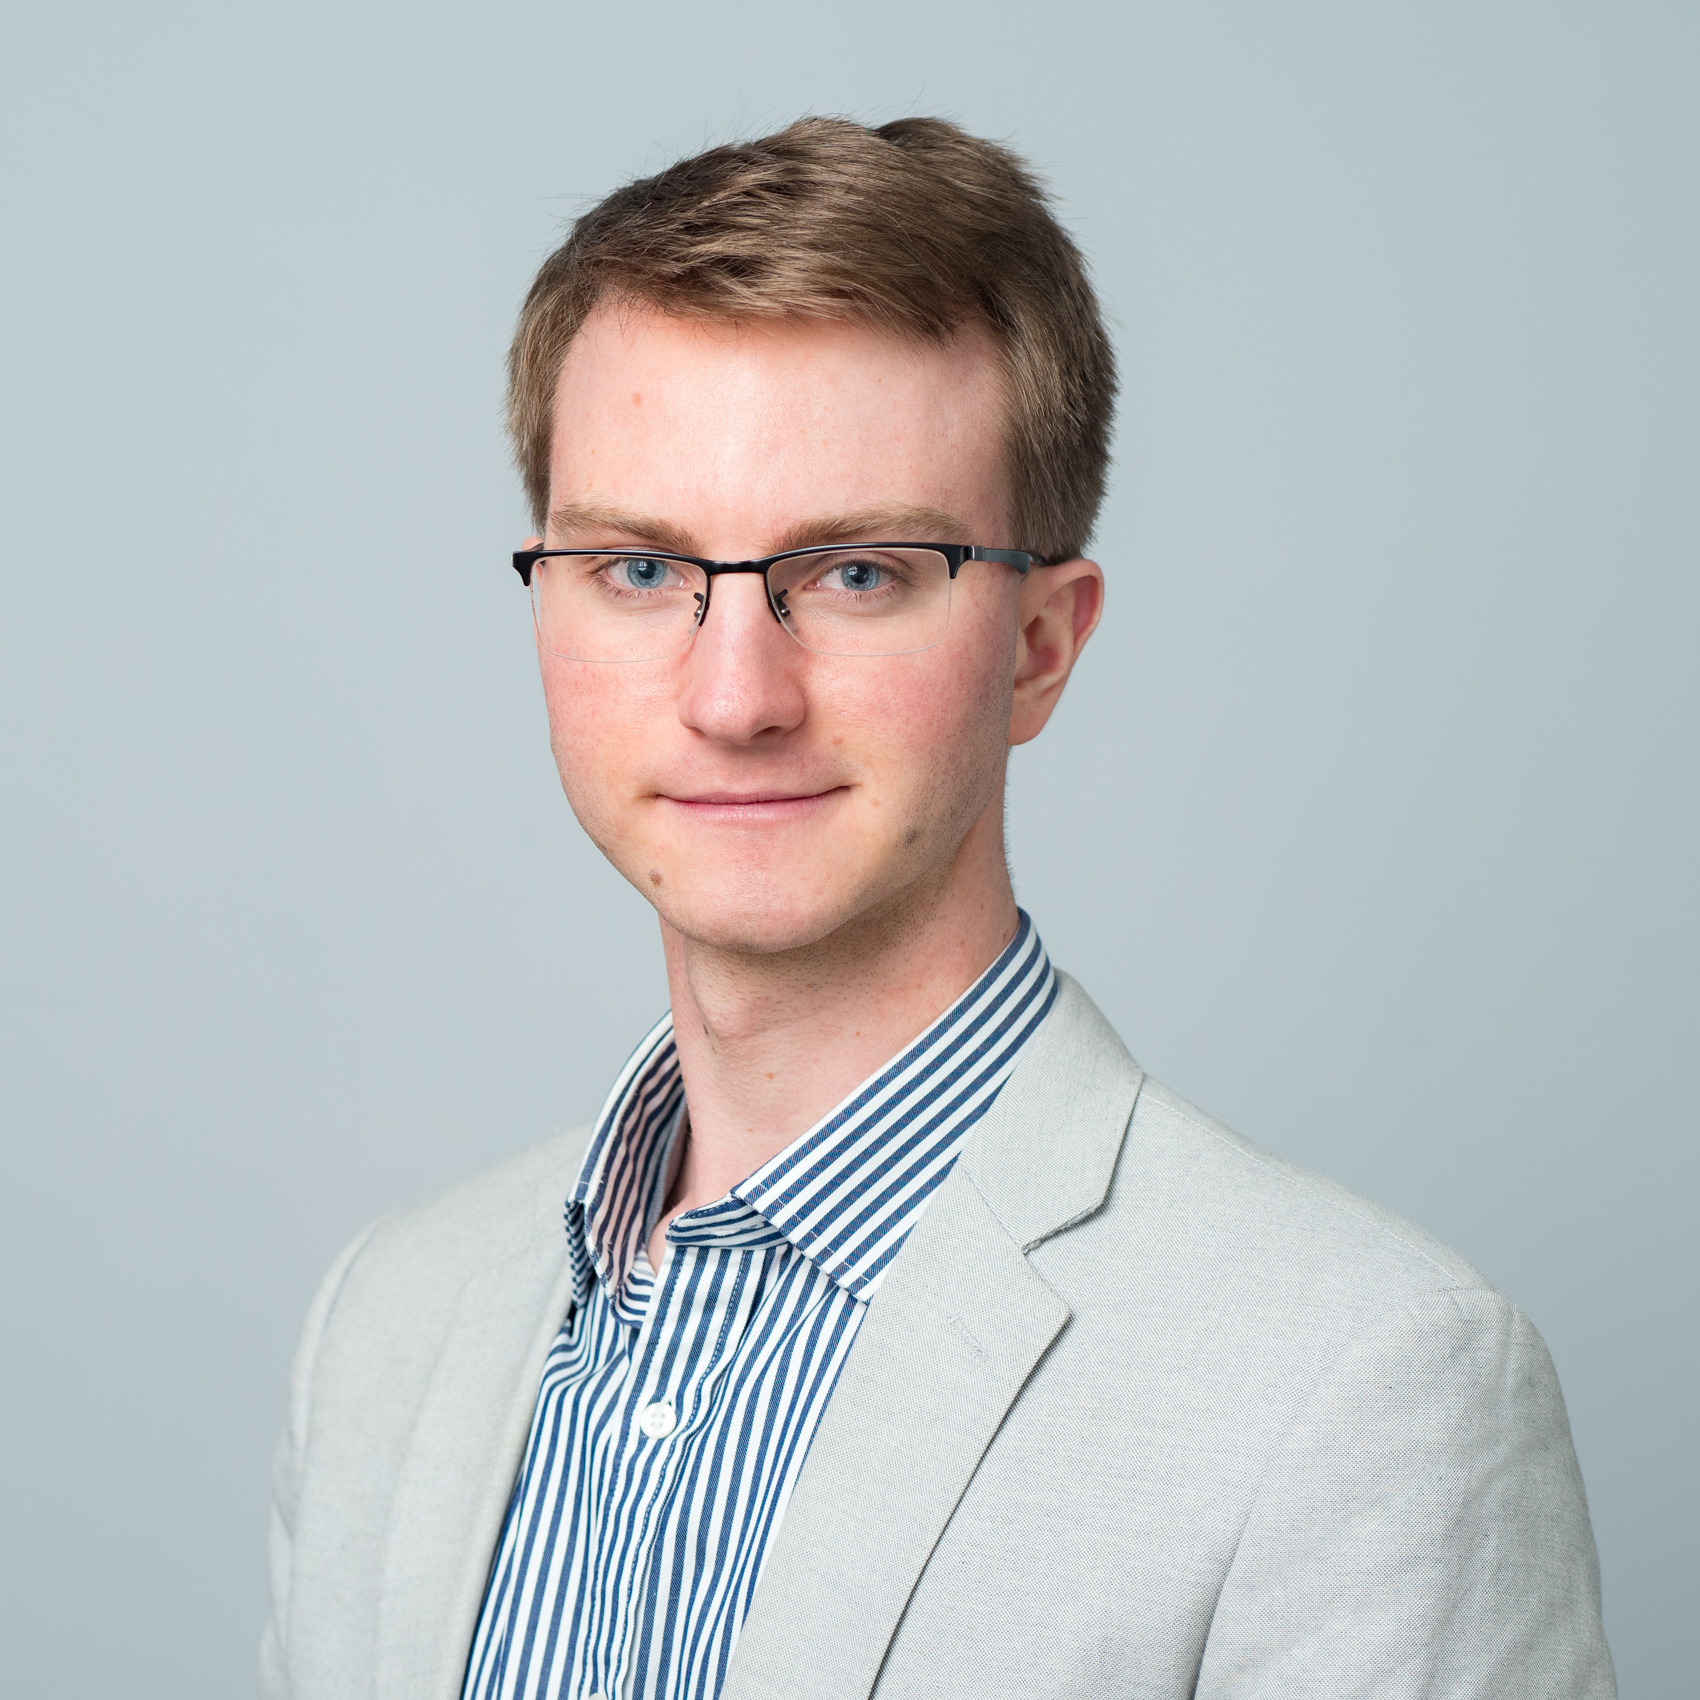 Tristan Dresbach